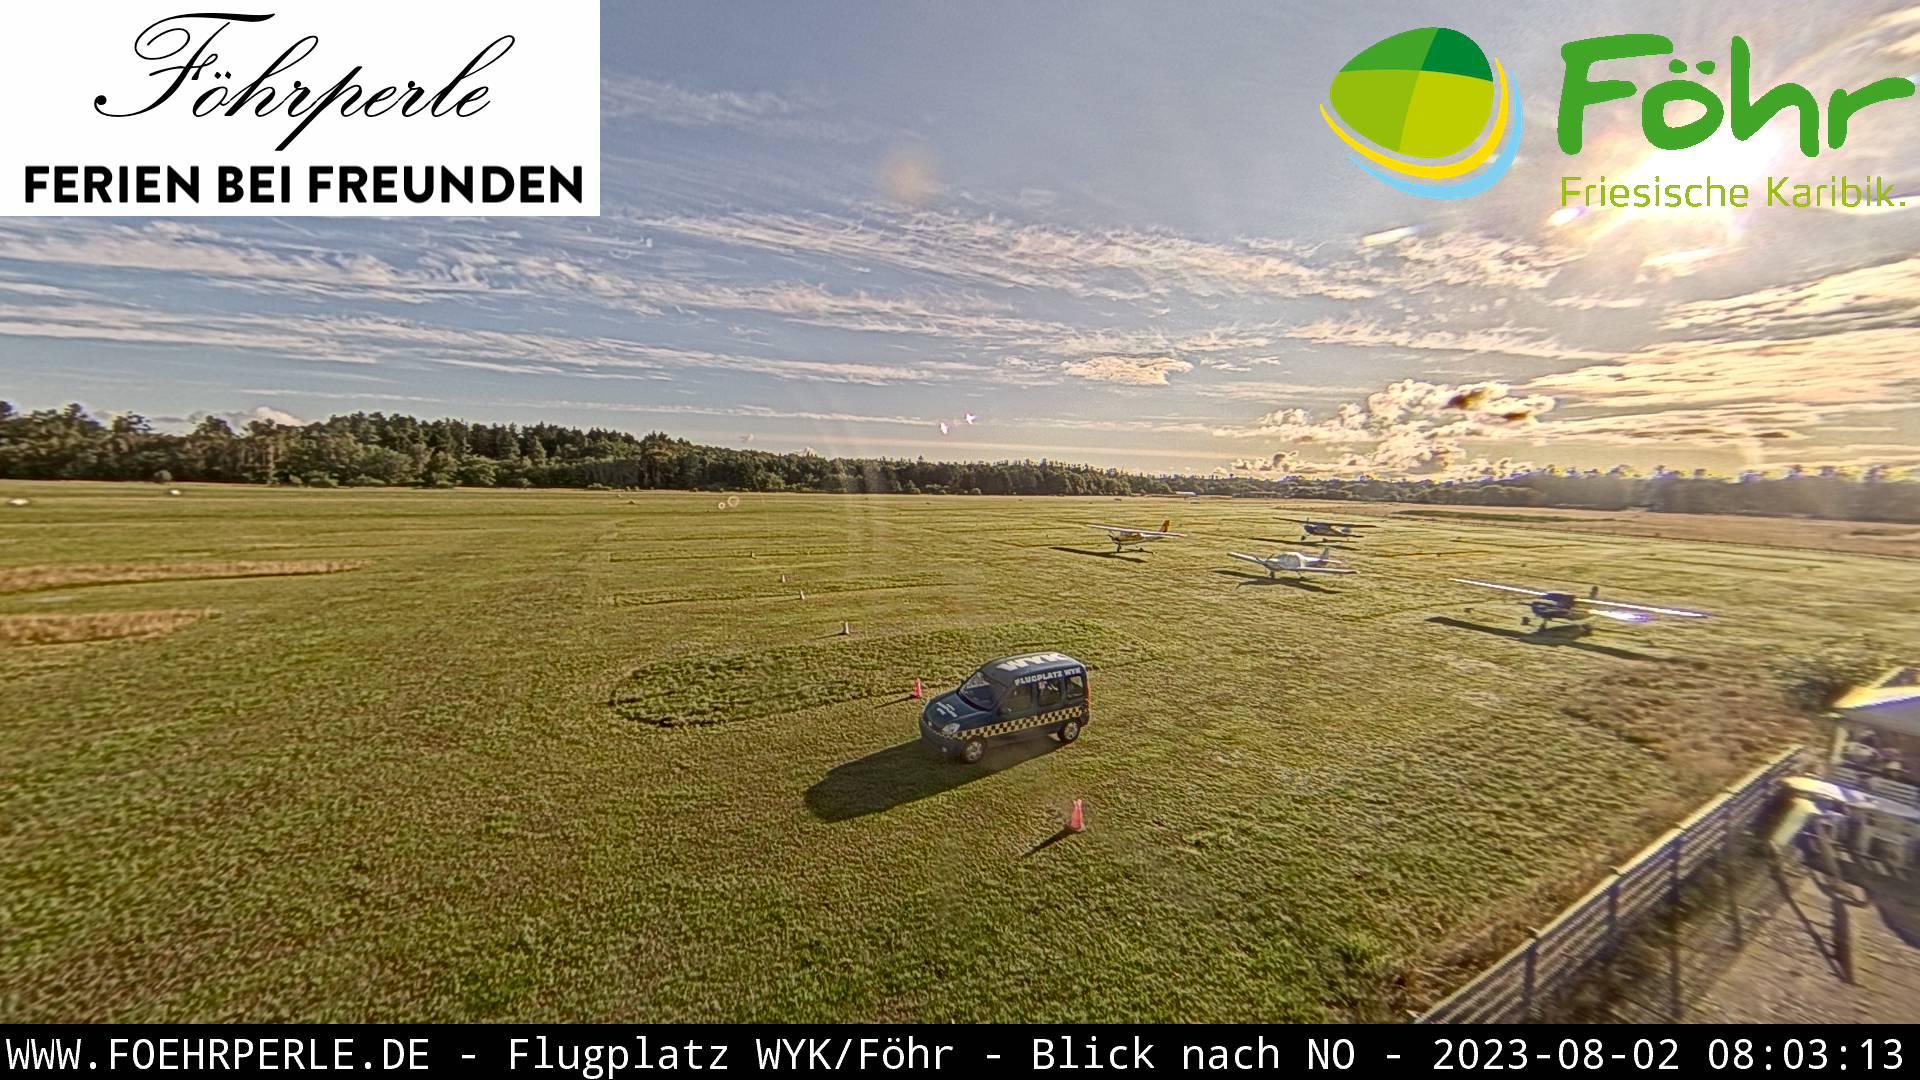 Webcam Föhr Flugplatz Wyk auf Föhr Webcams